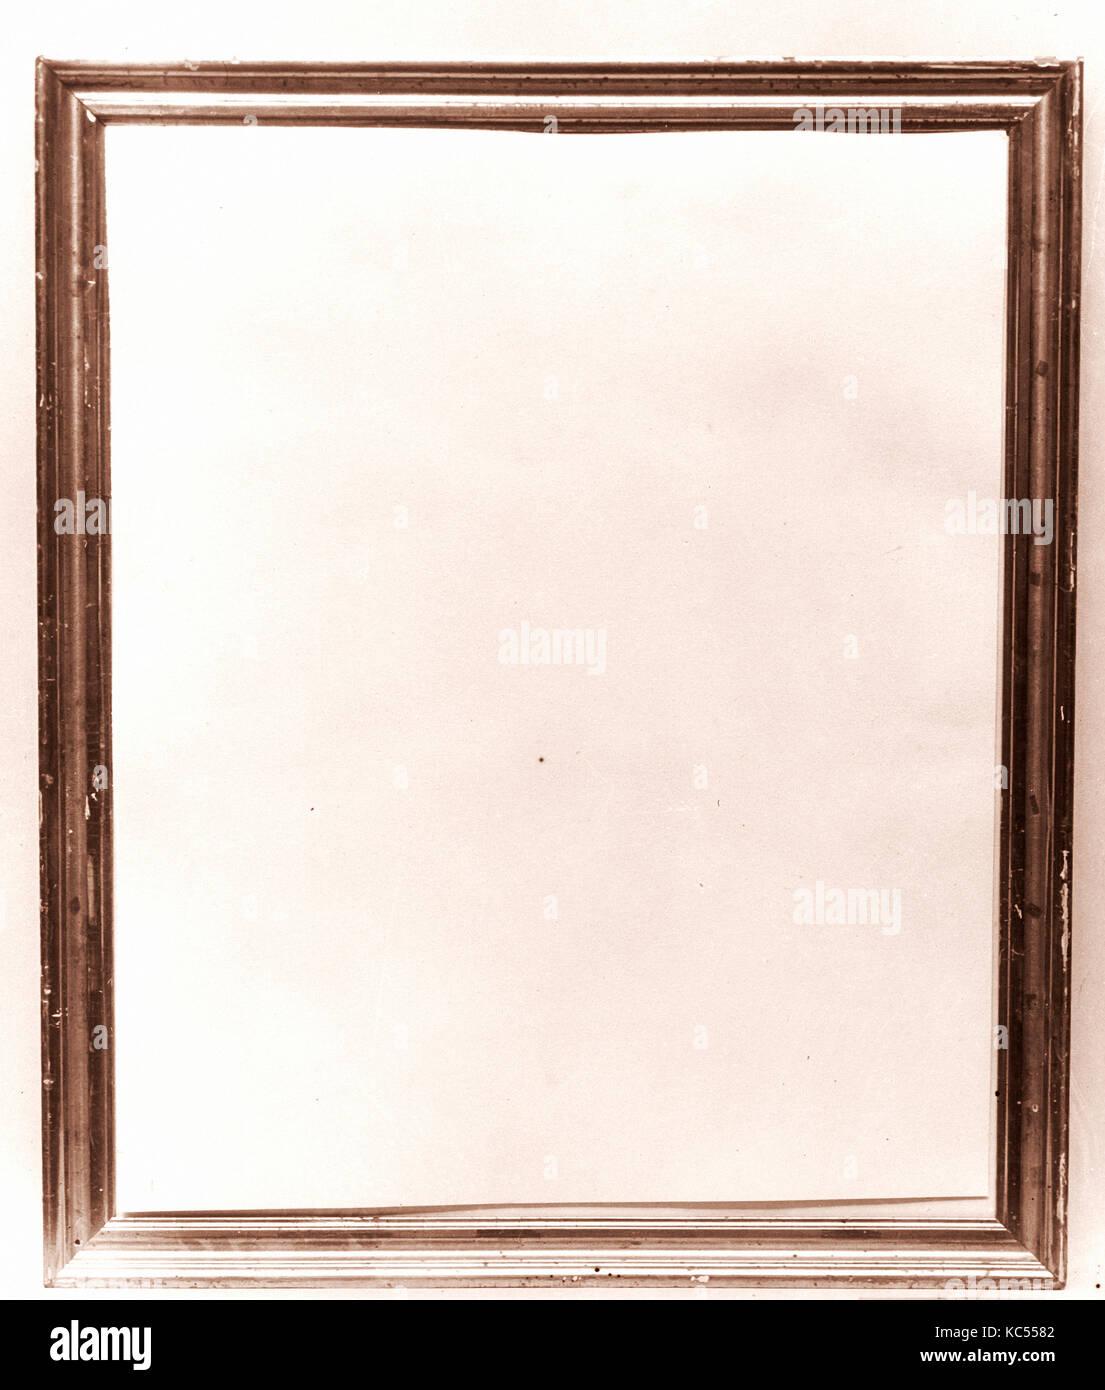 Bastidor, 1830-70, madera, dorados, 24 7/8 x 20 11/16 x 1 in. (63,2 ...